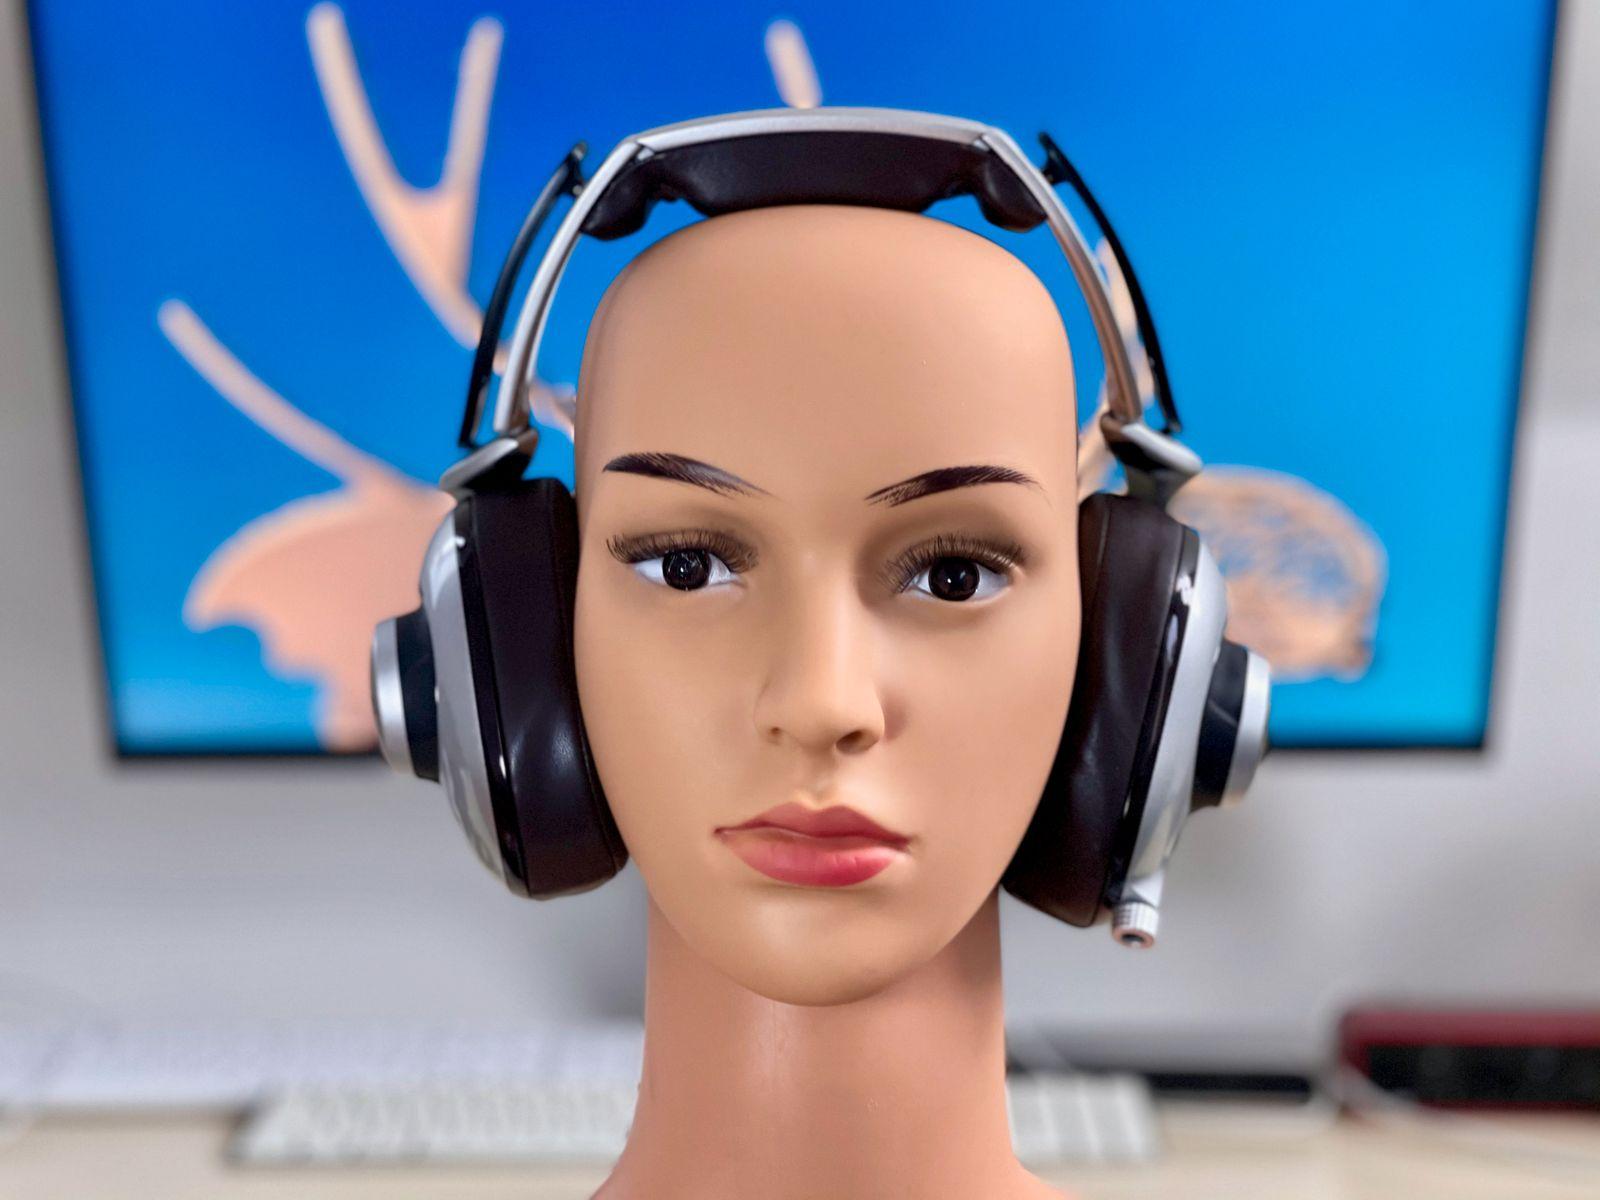 Kopfhörer / Blue Microphones Ella